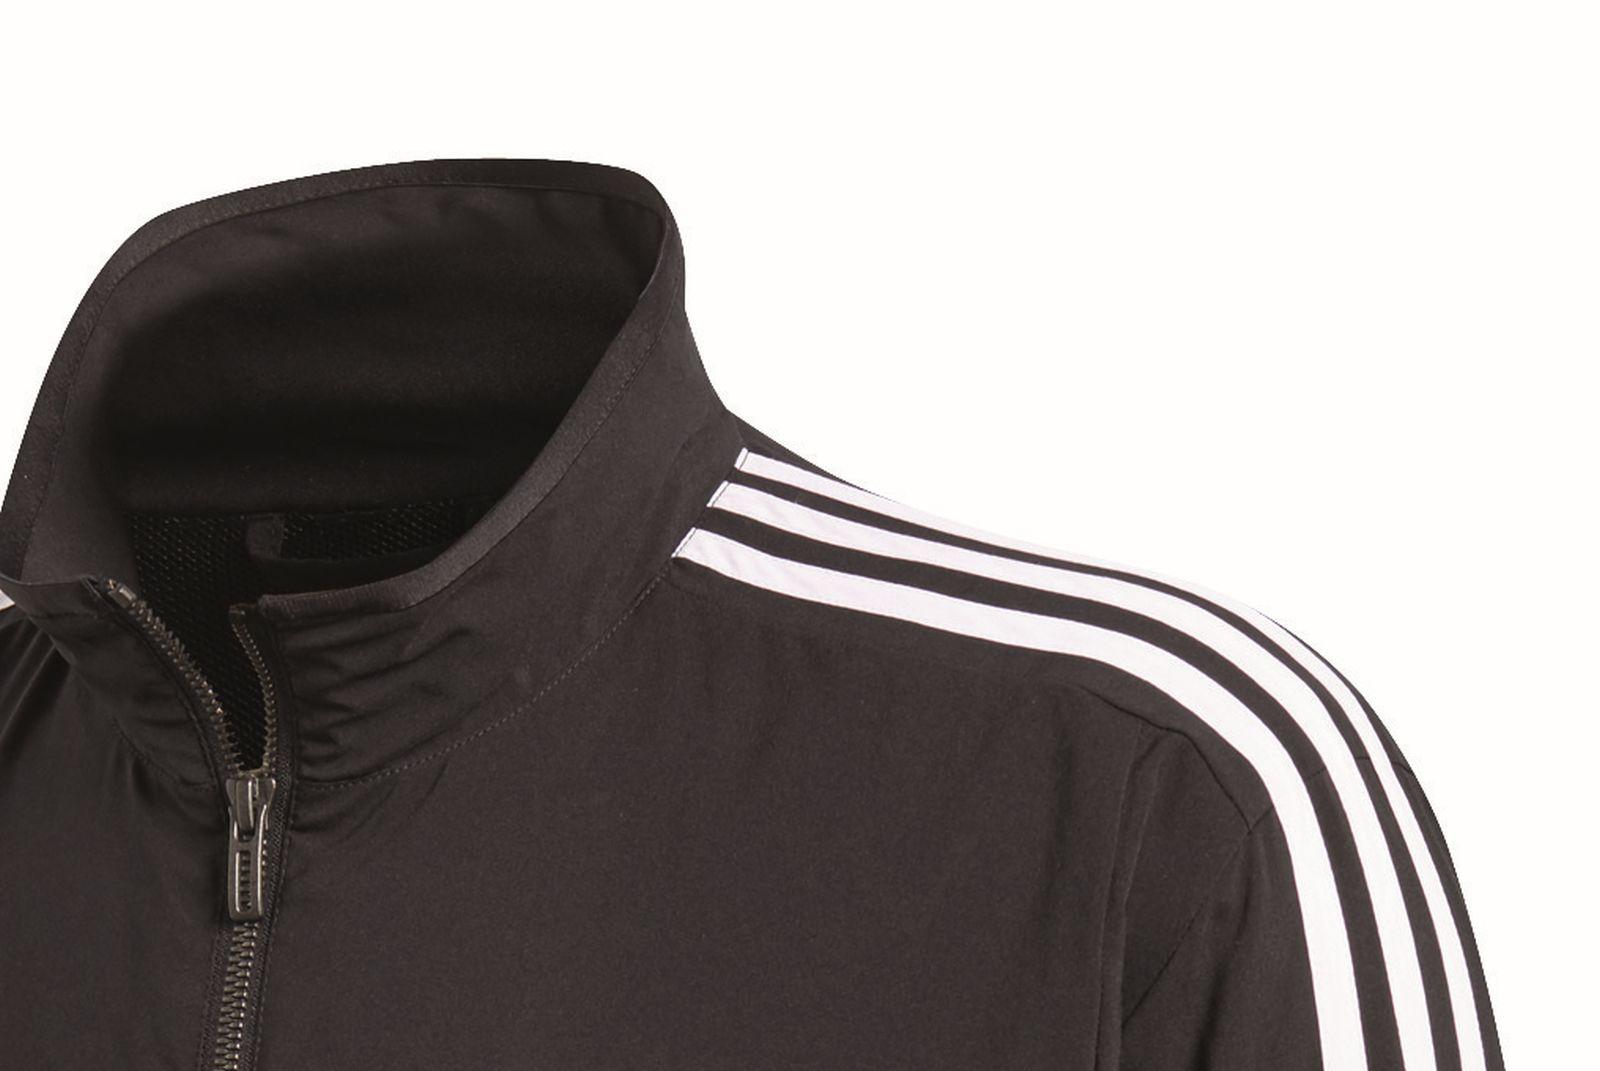 ba840a25f8 adidas Performance Herren Trainingsanzug 3S Woven Light Tracksuit schwarz  weiß